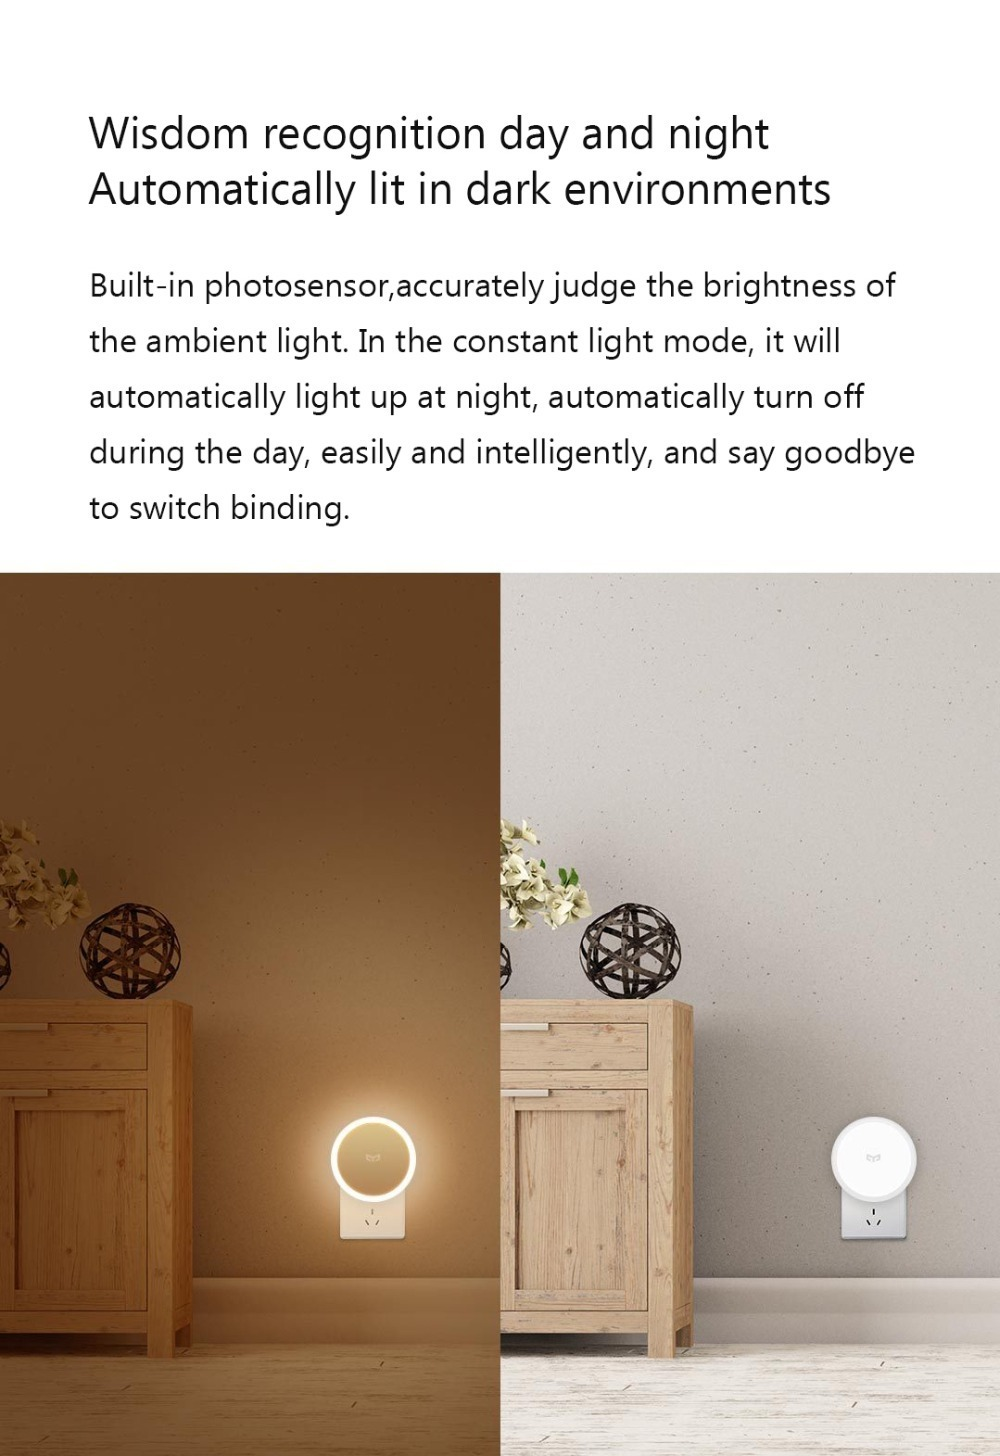 Bundled Sale Xiaomi mijia Yeelight induction night light (plug-in version) YLYD03YL led lamp bed lights for bedroom corridor Wal (12)